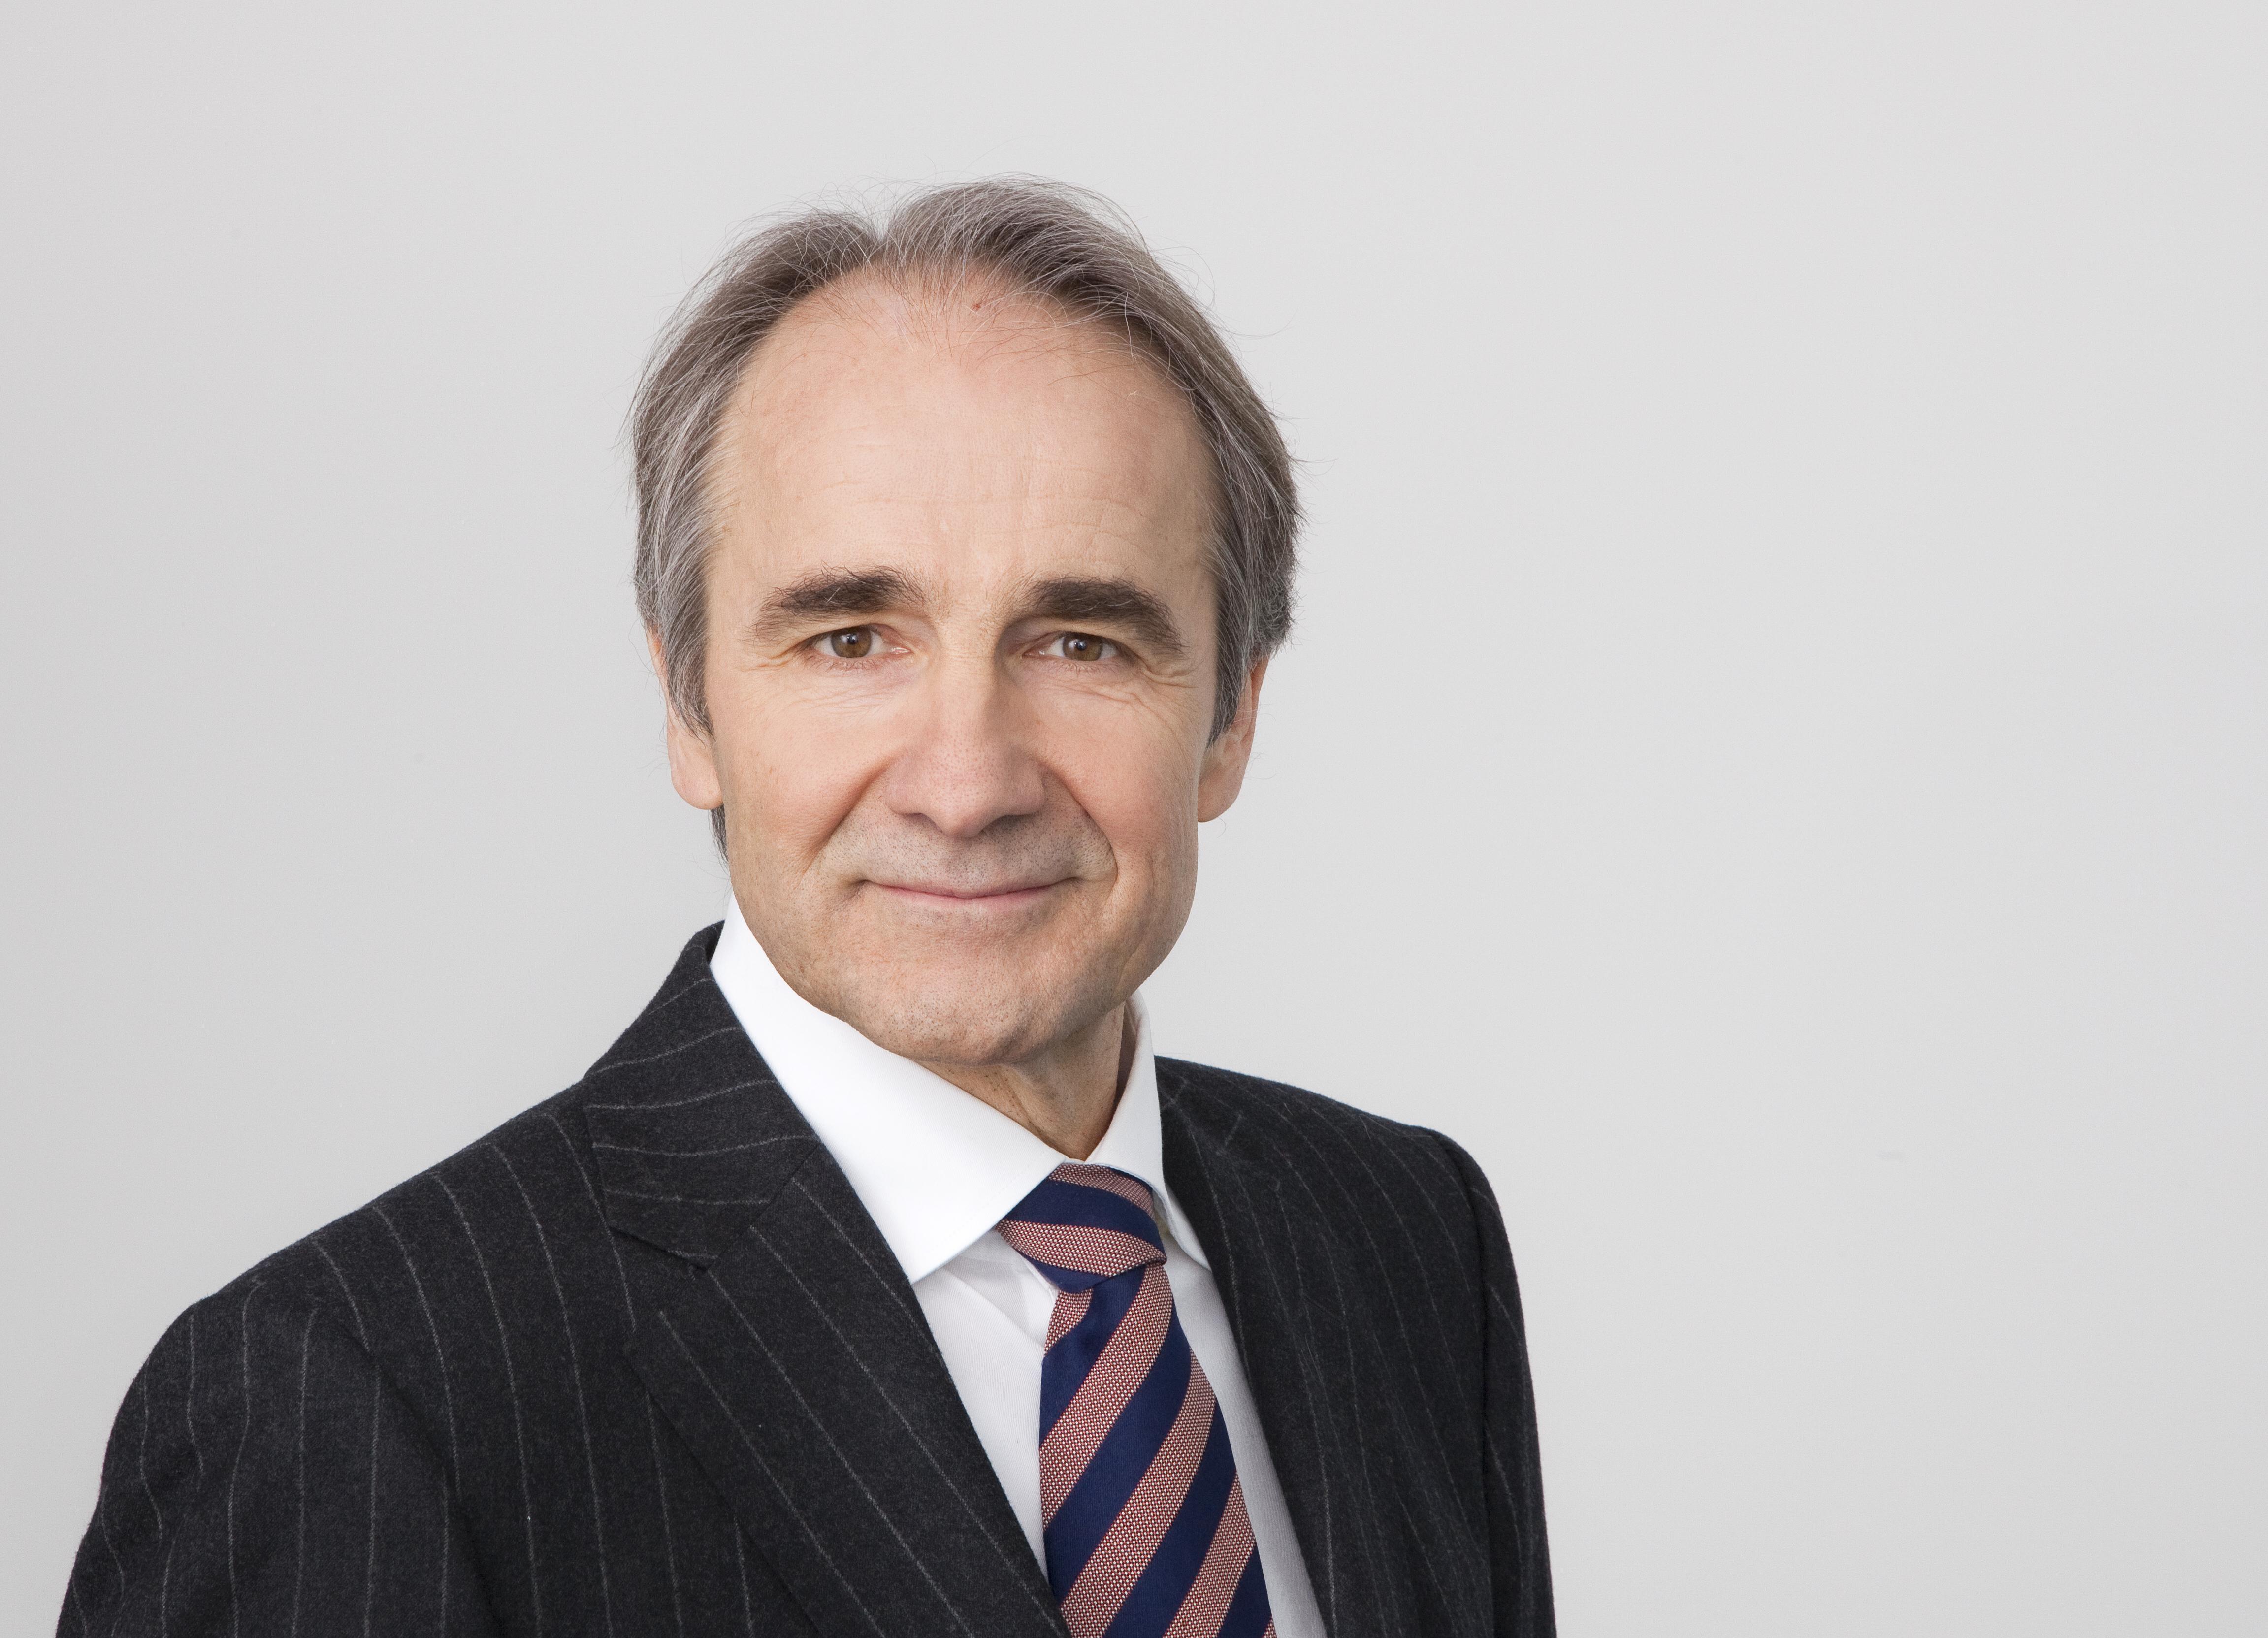 Karl-Heinz Streibich, chief executive officer, Software AG